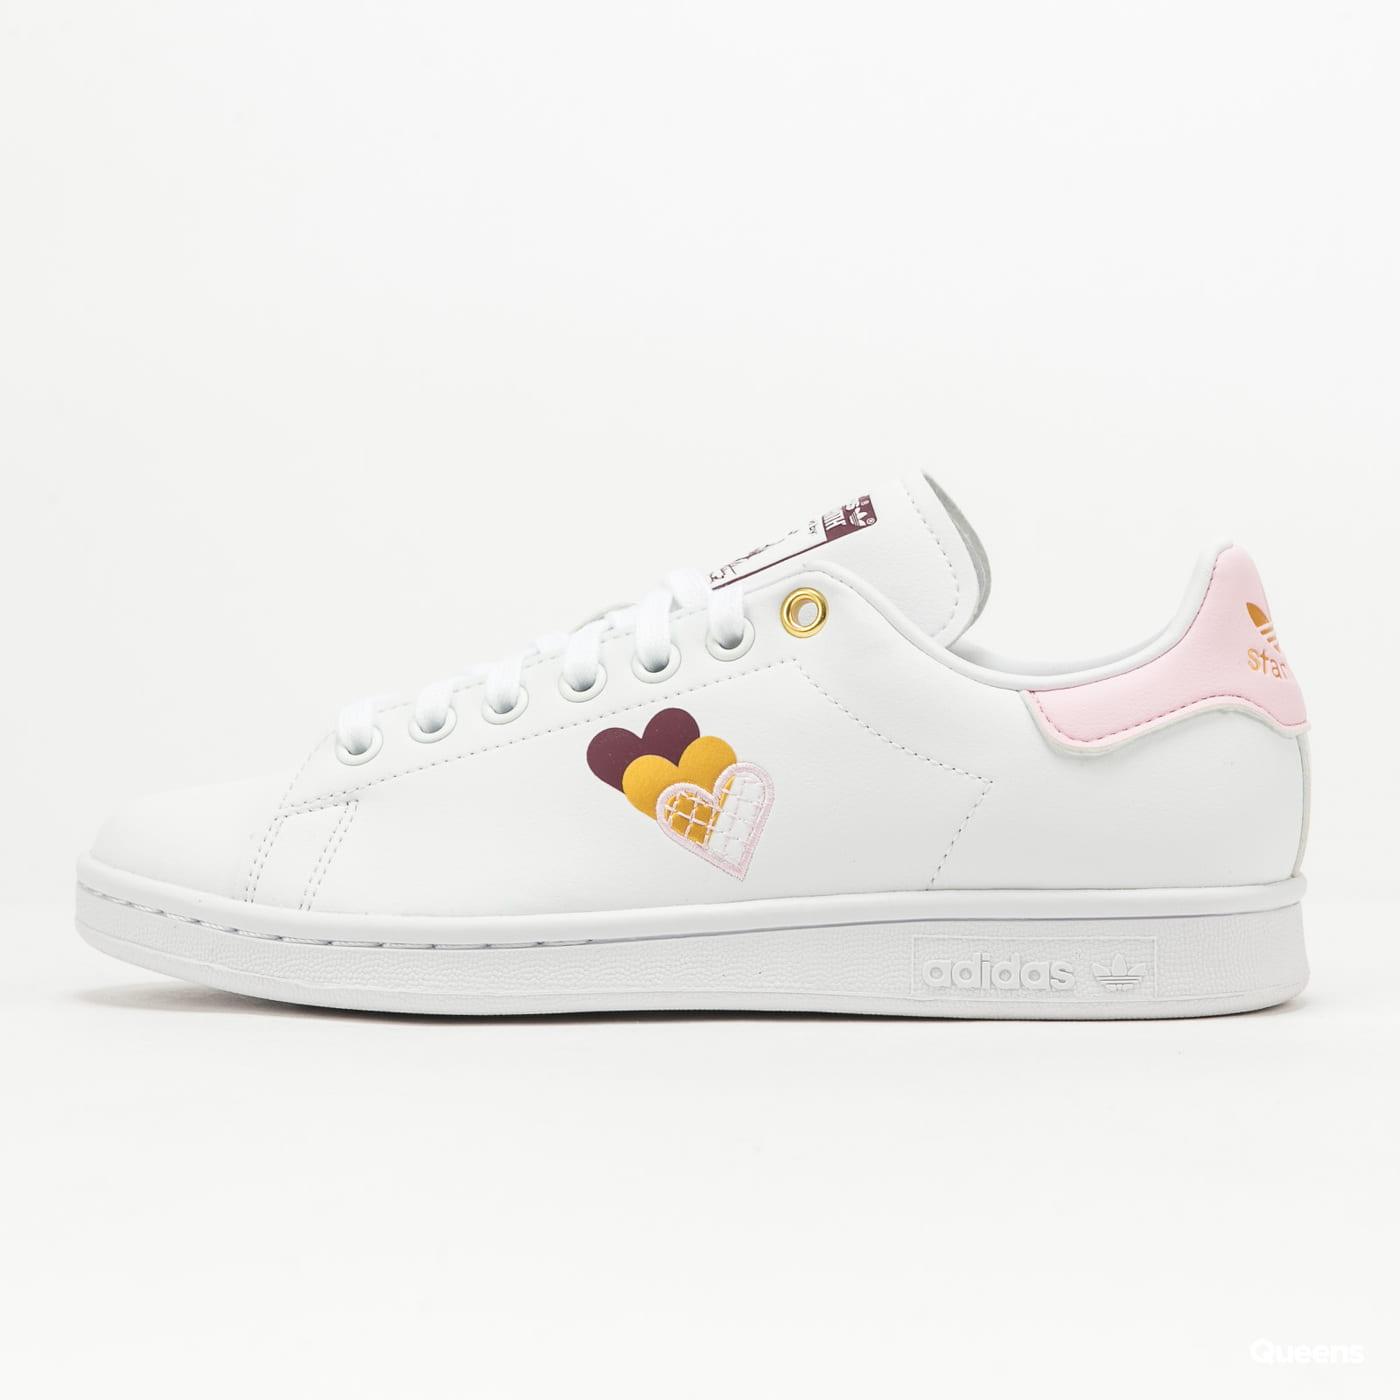 adidas Originals Stan Smith W ftwwht / clpink / viccri